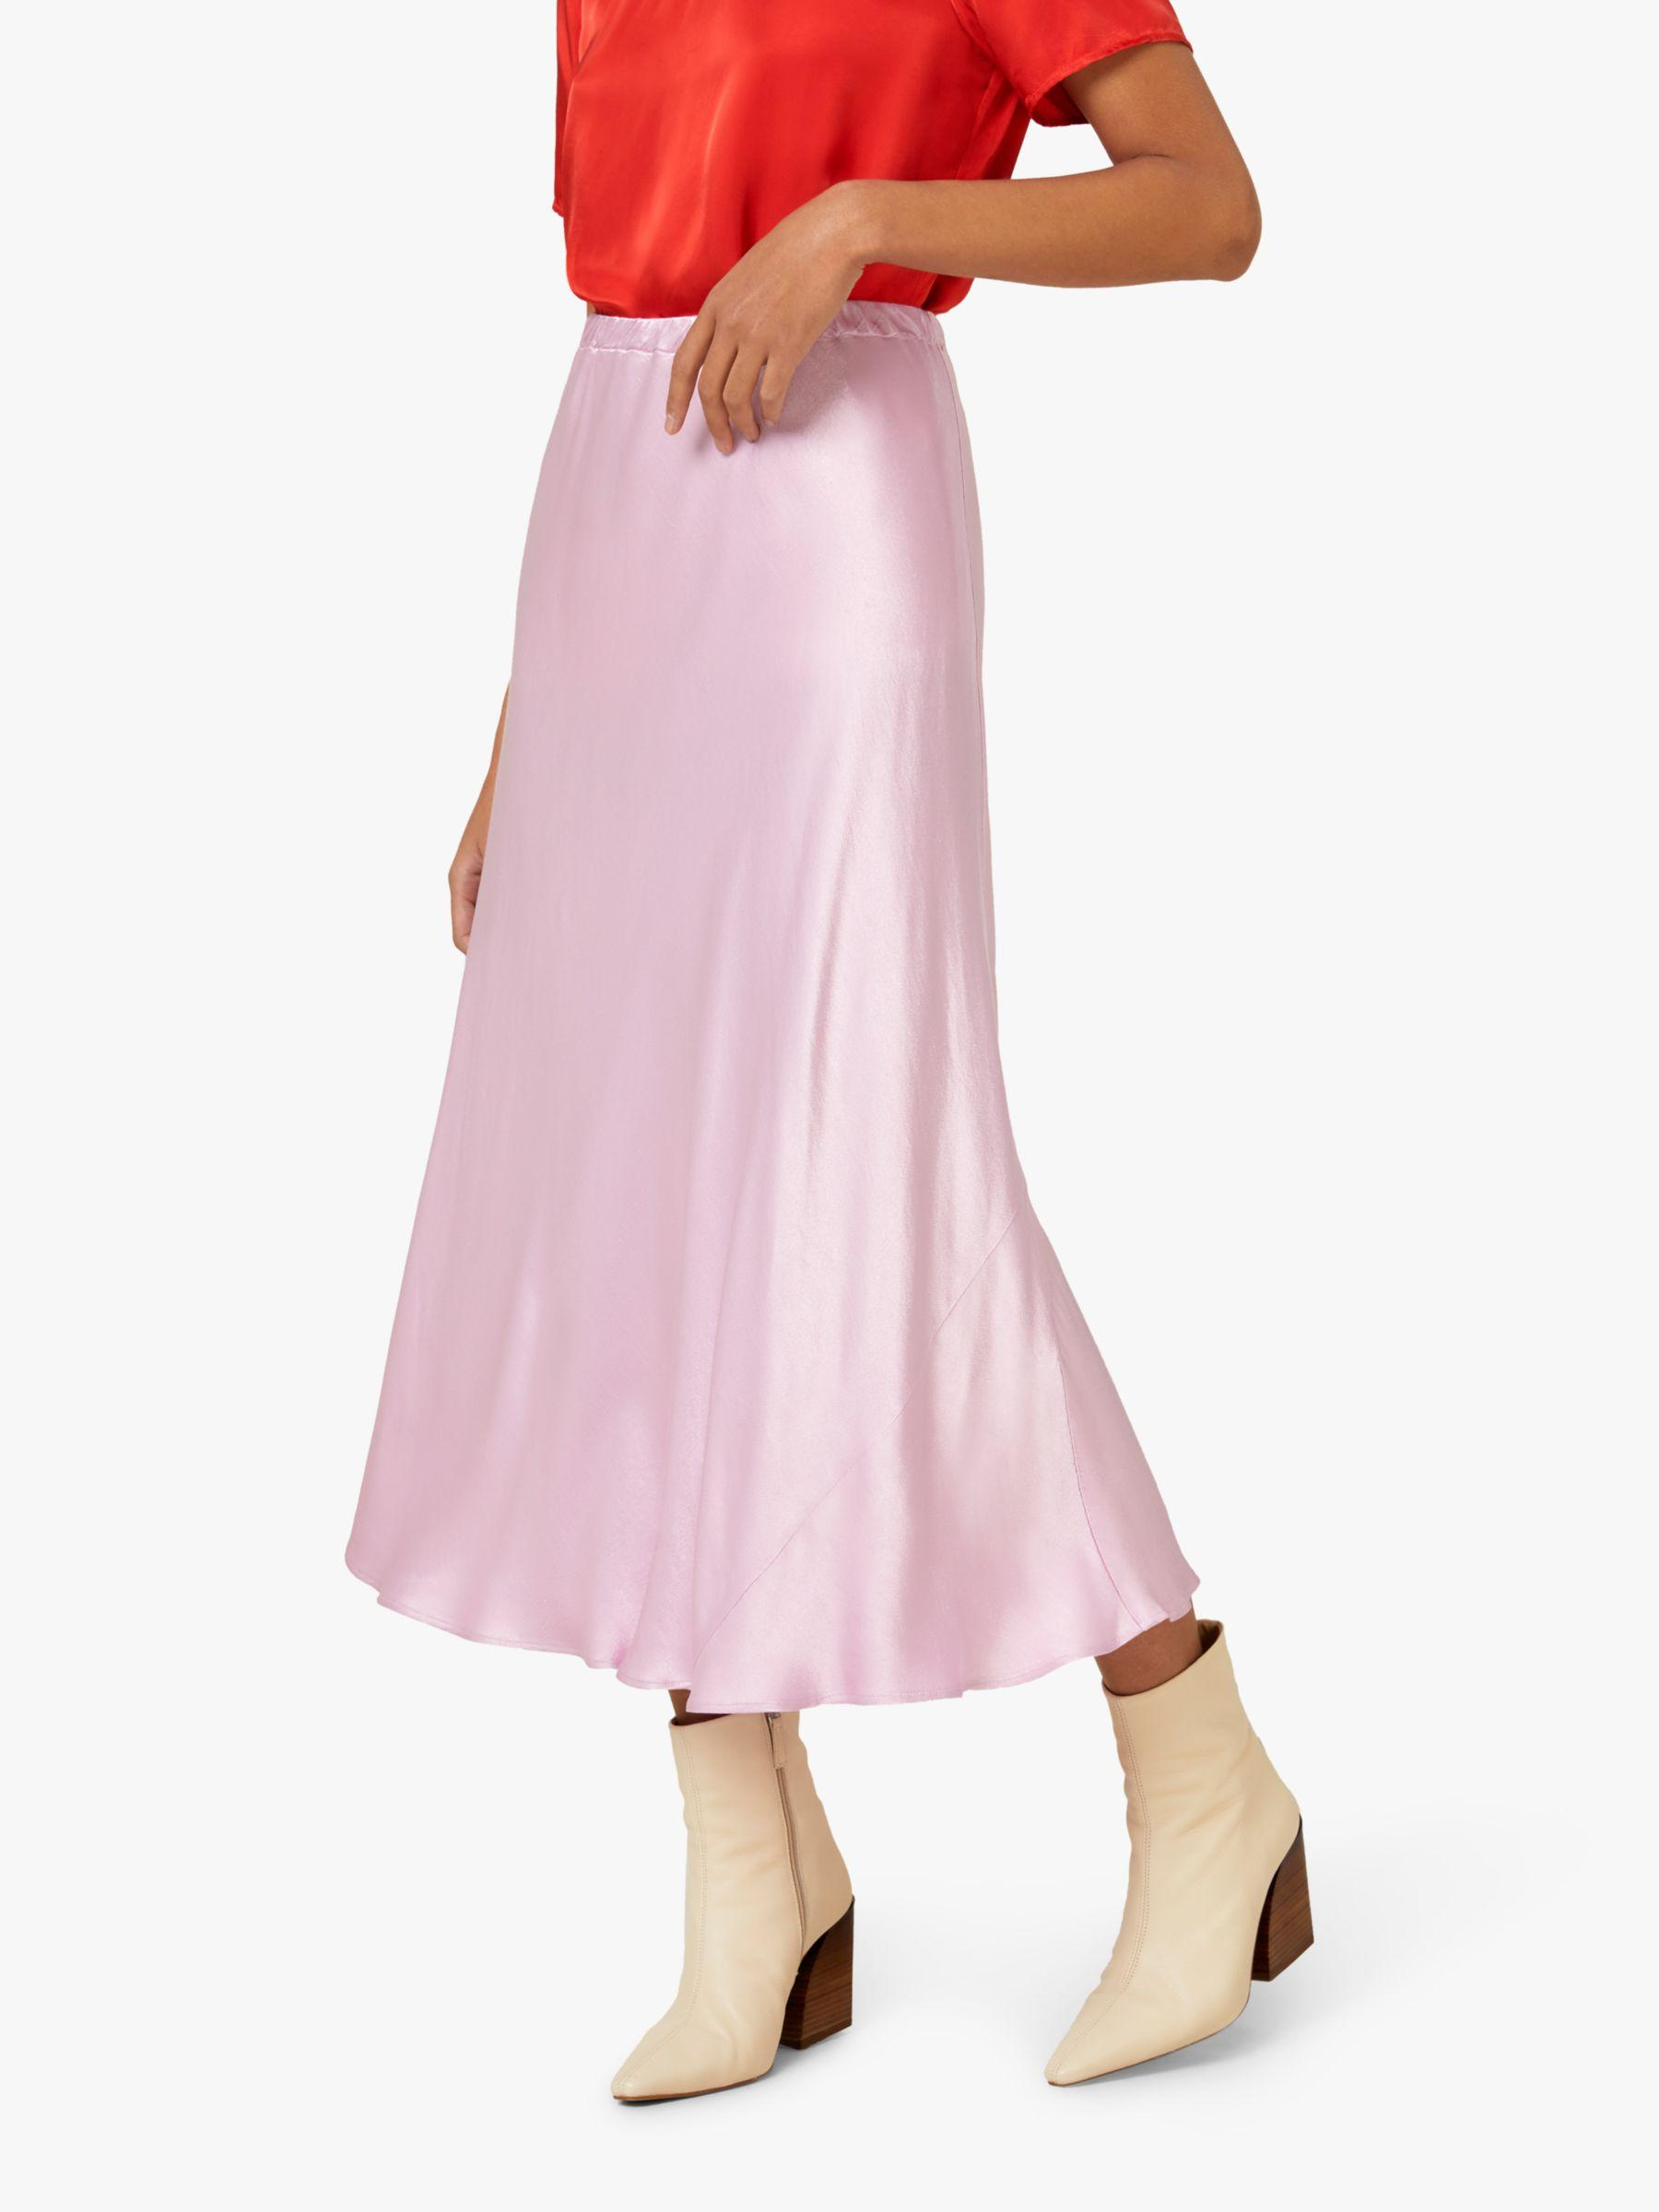 df6f4c015c Finery London Alberte Satin Skirt in Pink - Lyst